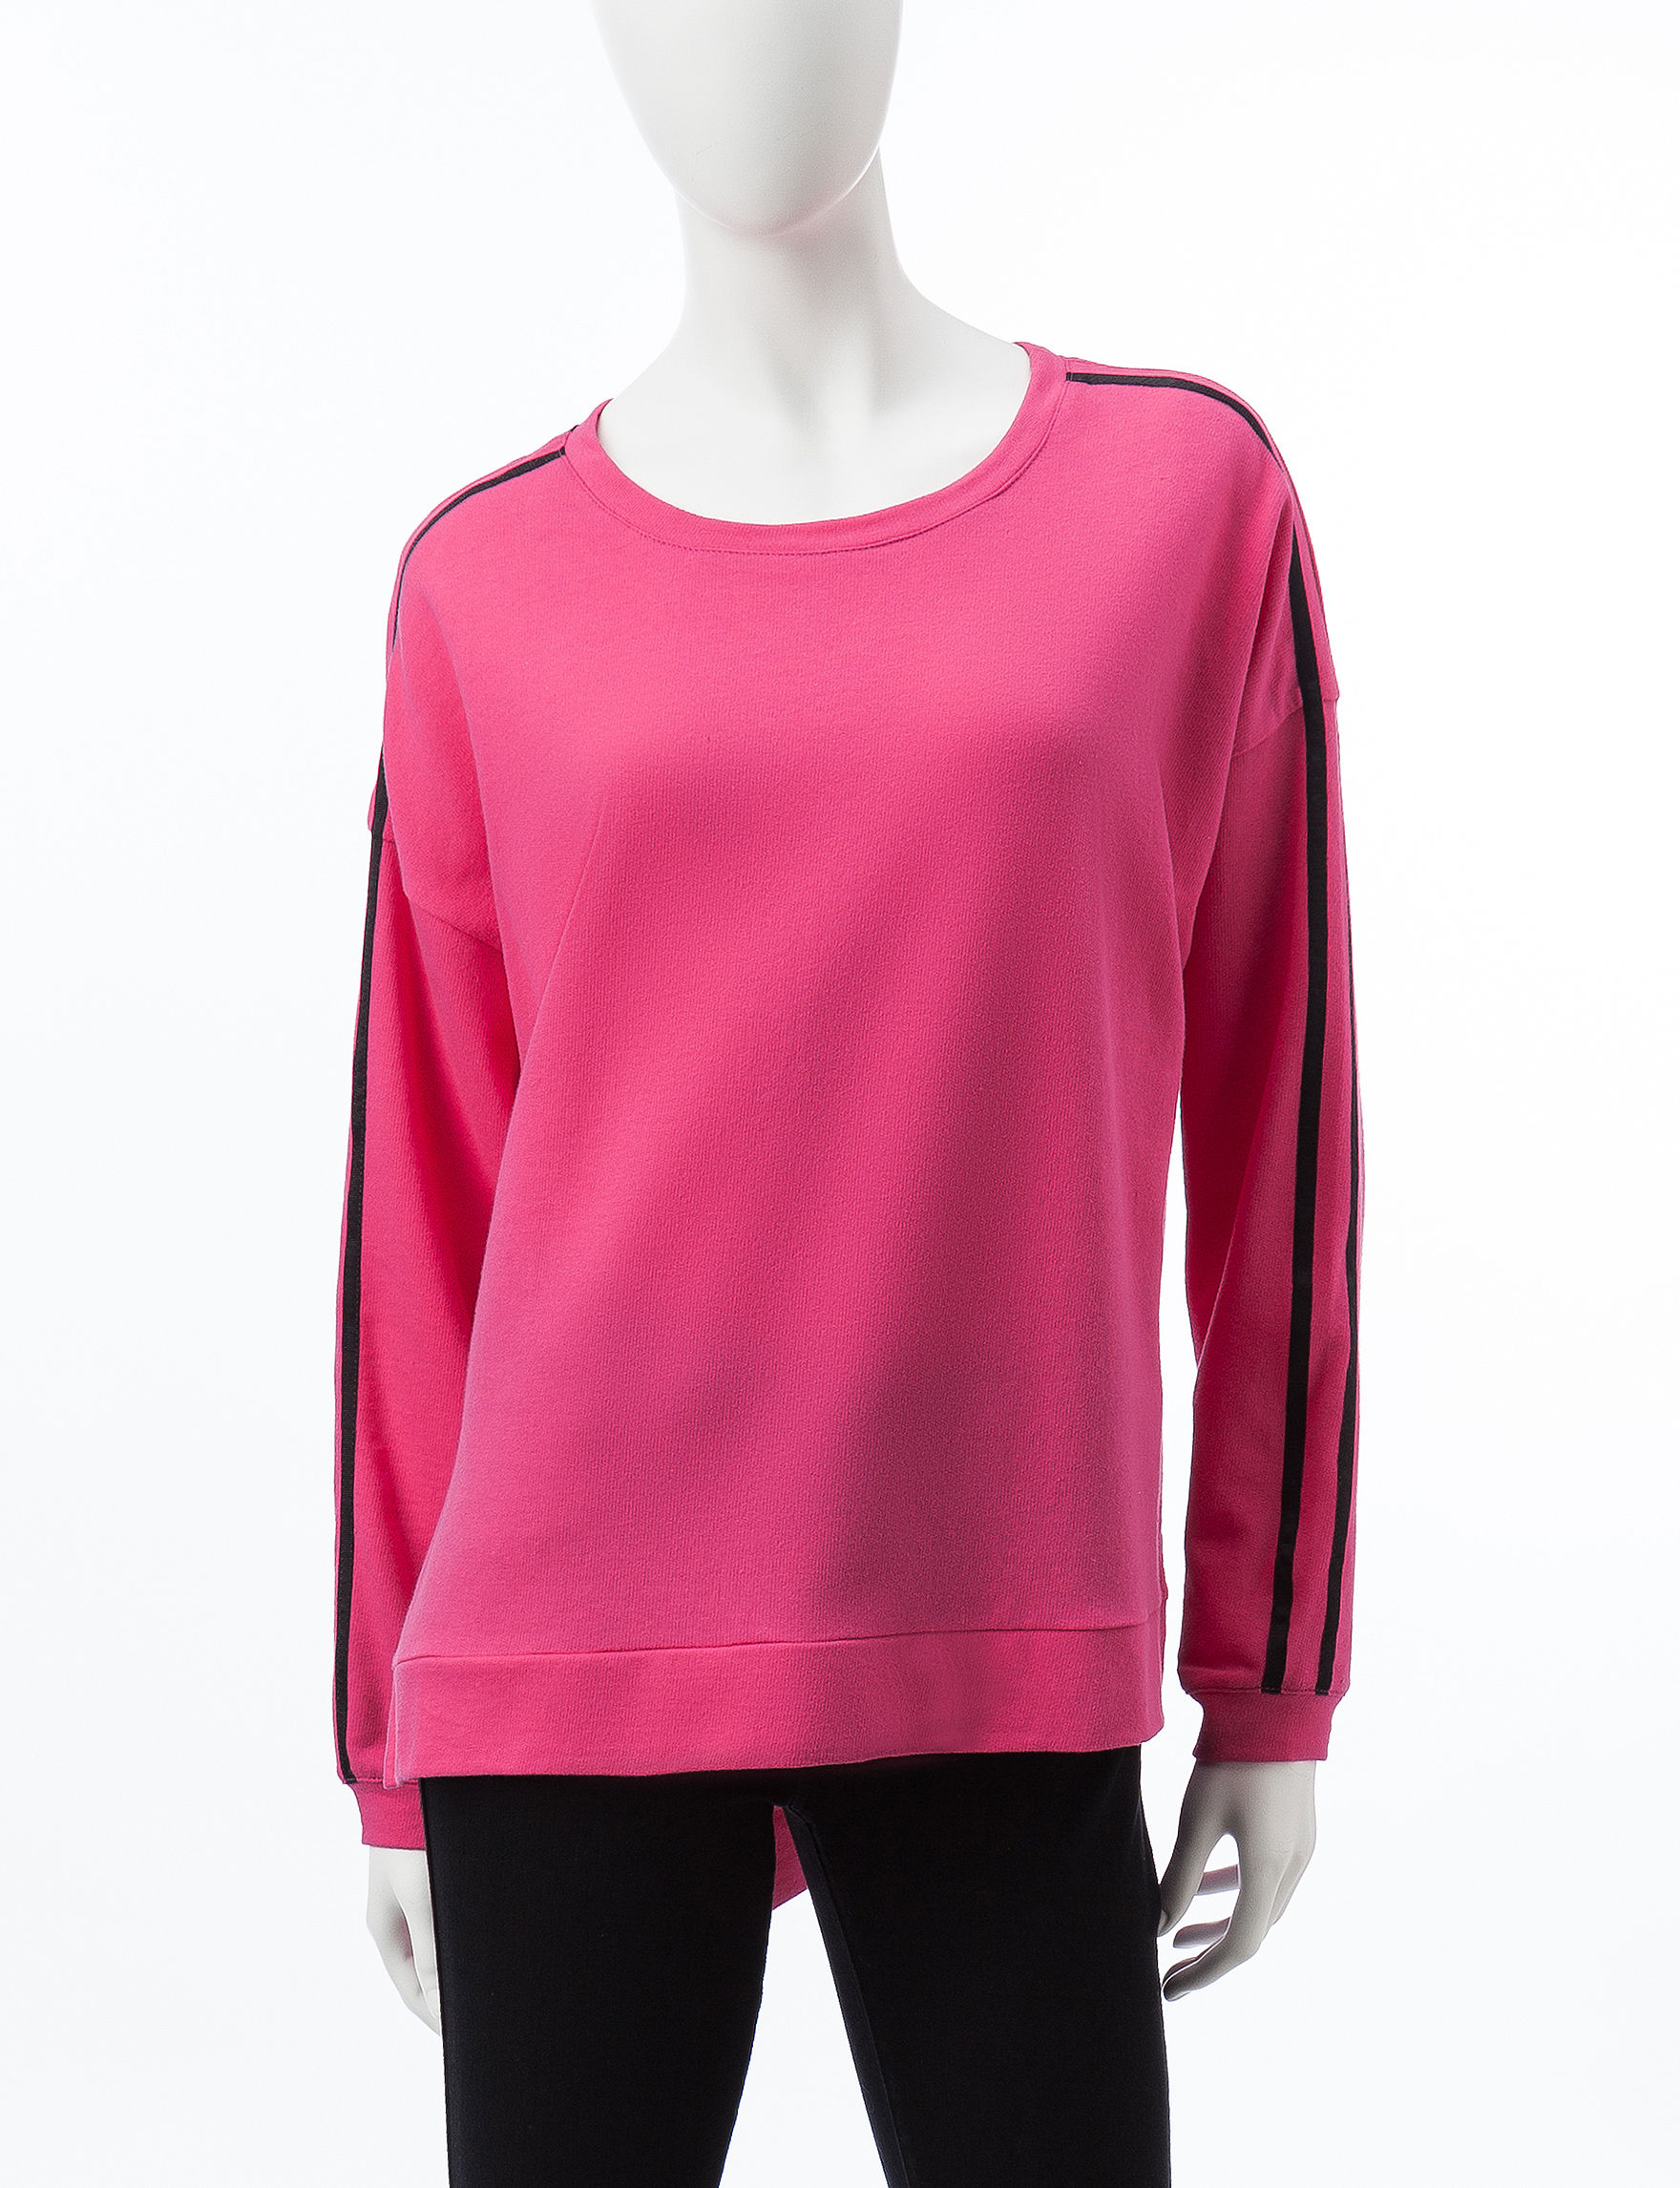 Justify Pink Shirts & Blouses